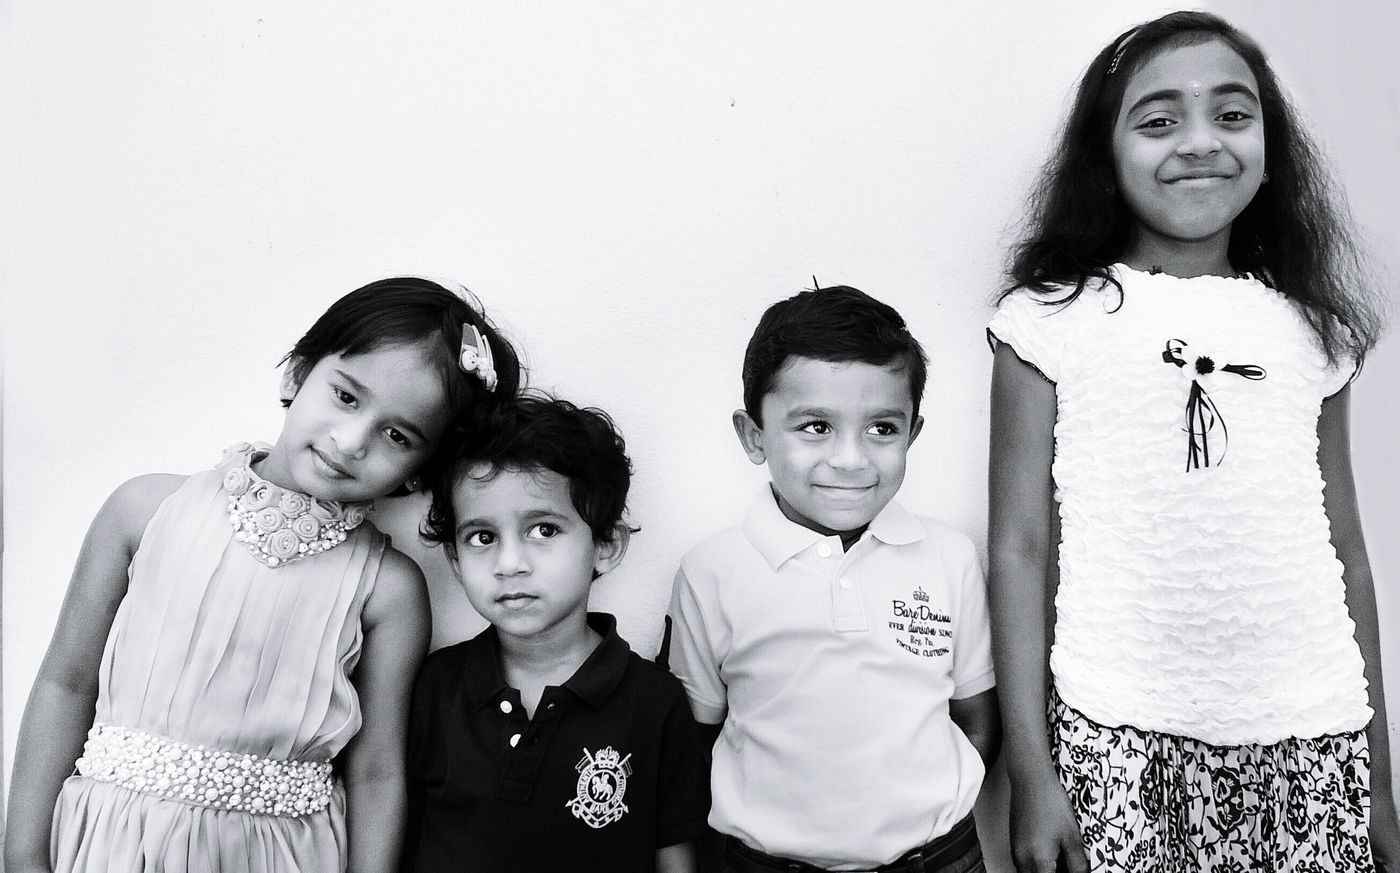 True Happiness Children Photography Smile Next Generation EyeEm Best Shots Face Of Happiness Children Children's Portraits My Family